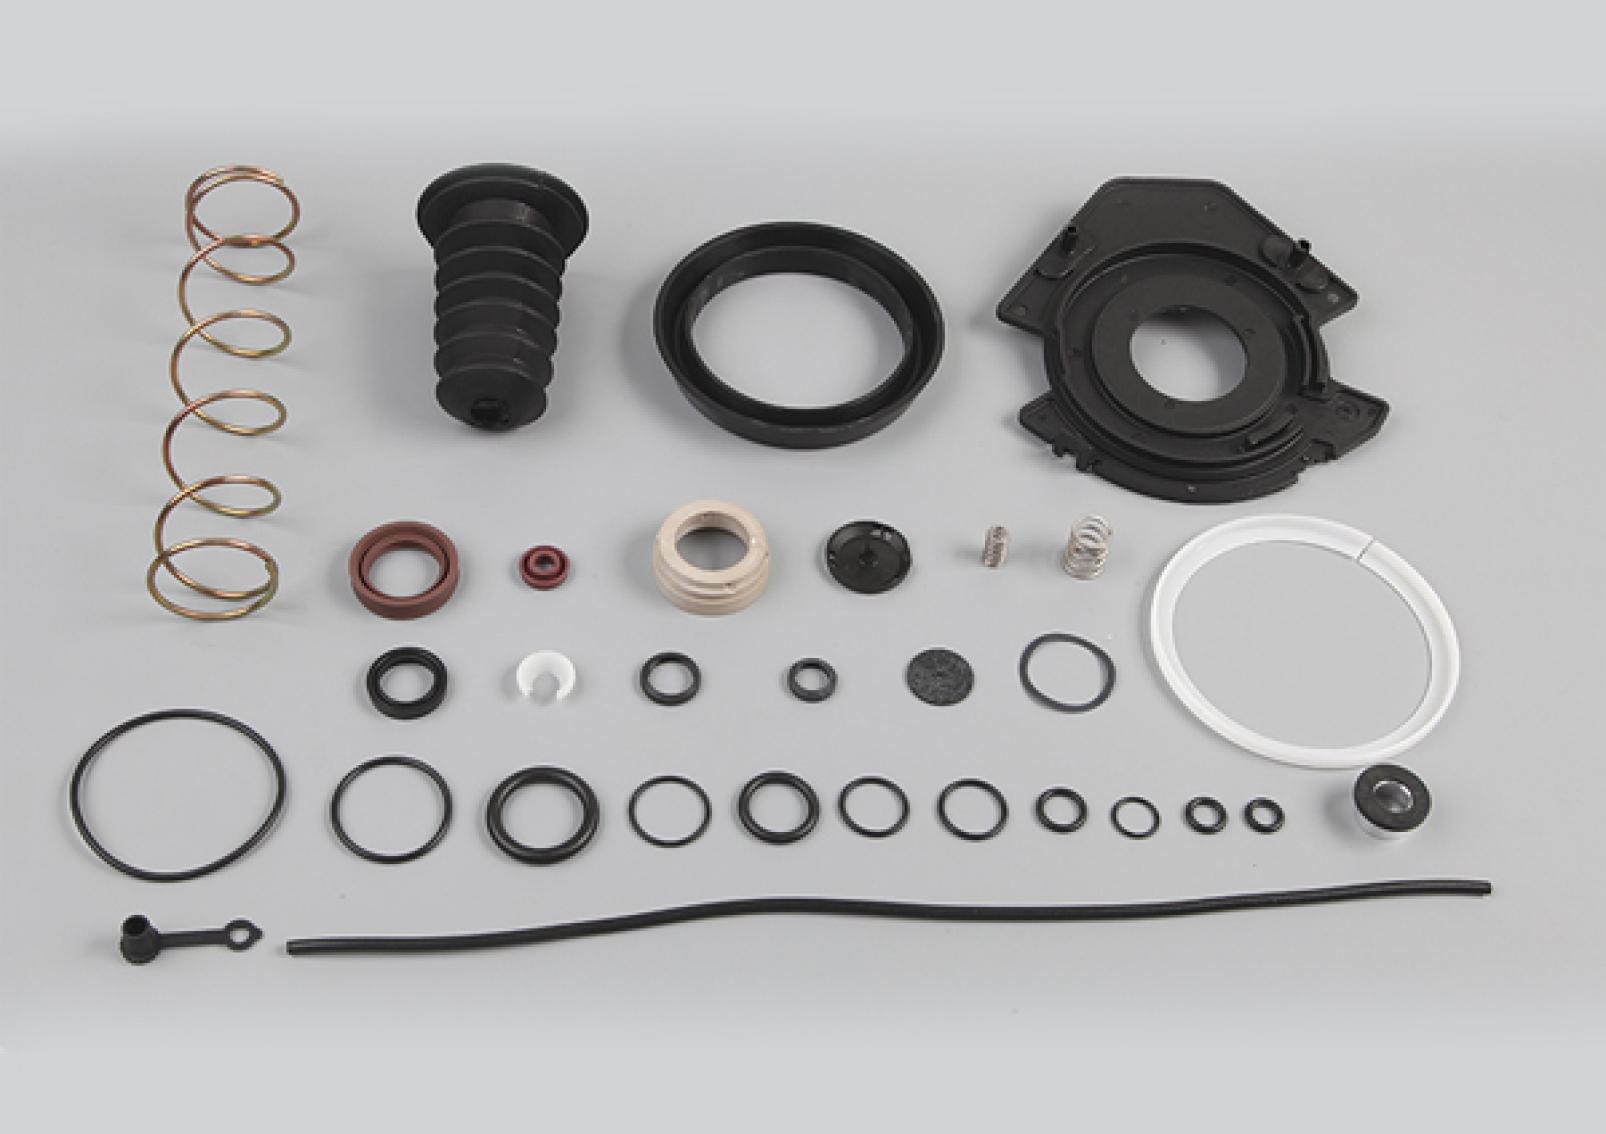 Clutch Servo Repair Kit for Mercedes Benz, Man, Daf, 970 051 971 2 (Mineral Oil, Pentosin)